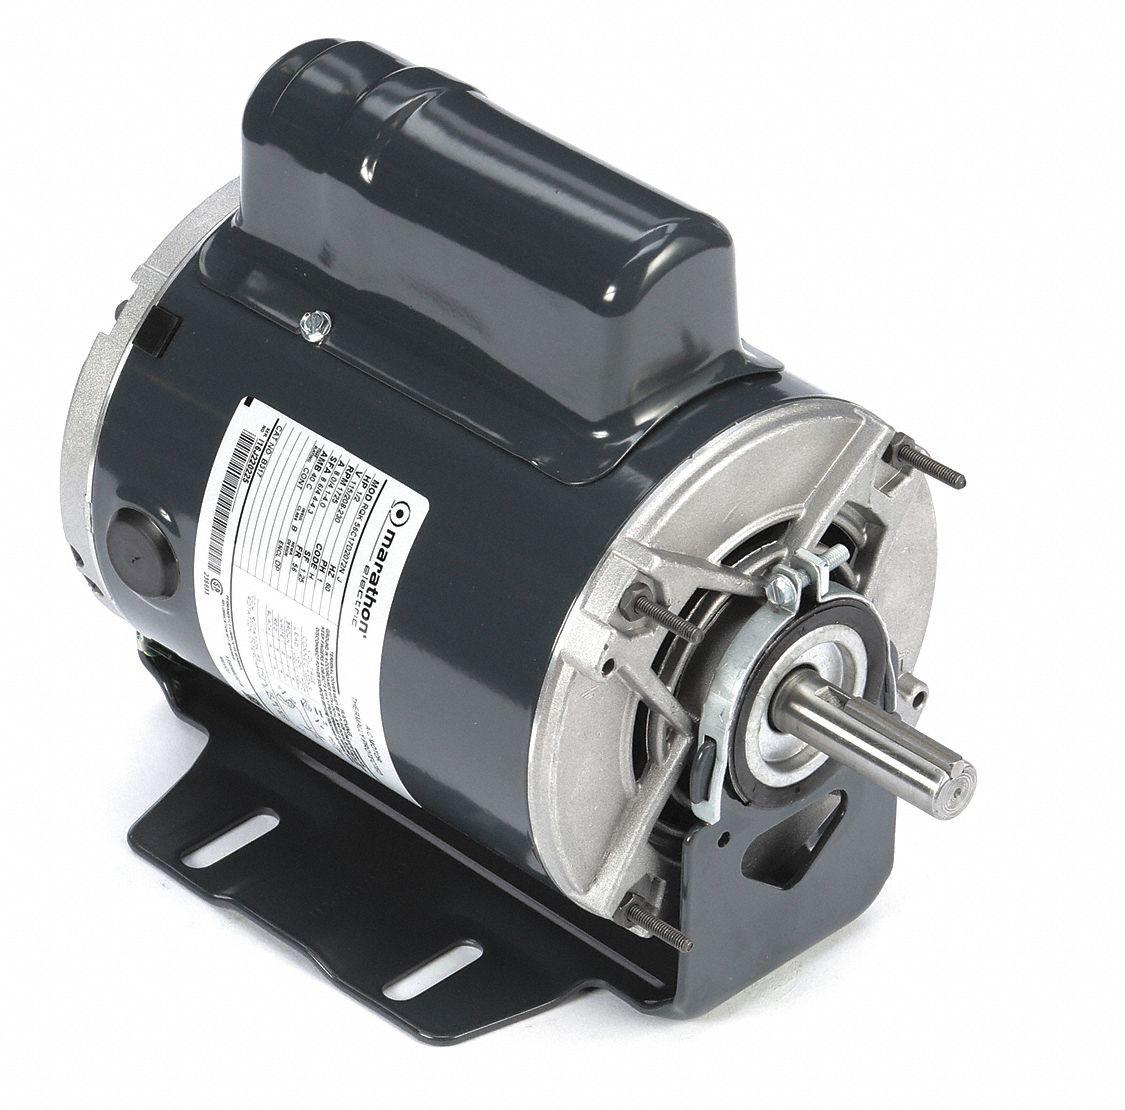 hight resolution of marathon motors 1 2 hp general purpose motor capacitor start 1725 nameplate rpm voltage 115 208 230 frame 56 46n369 056c17d2072 grainger